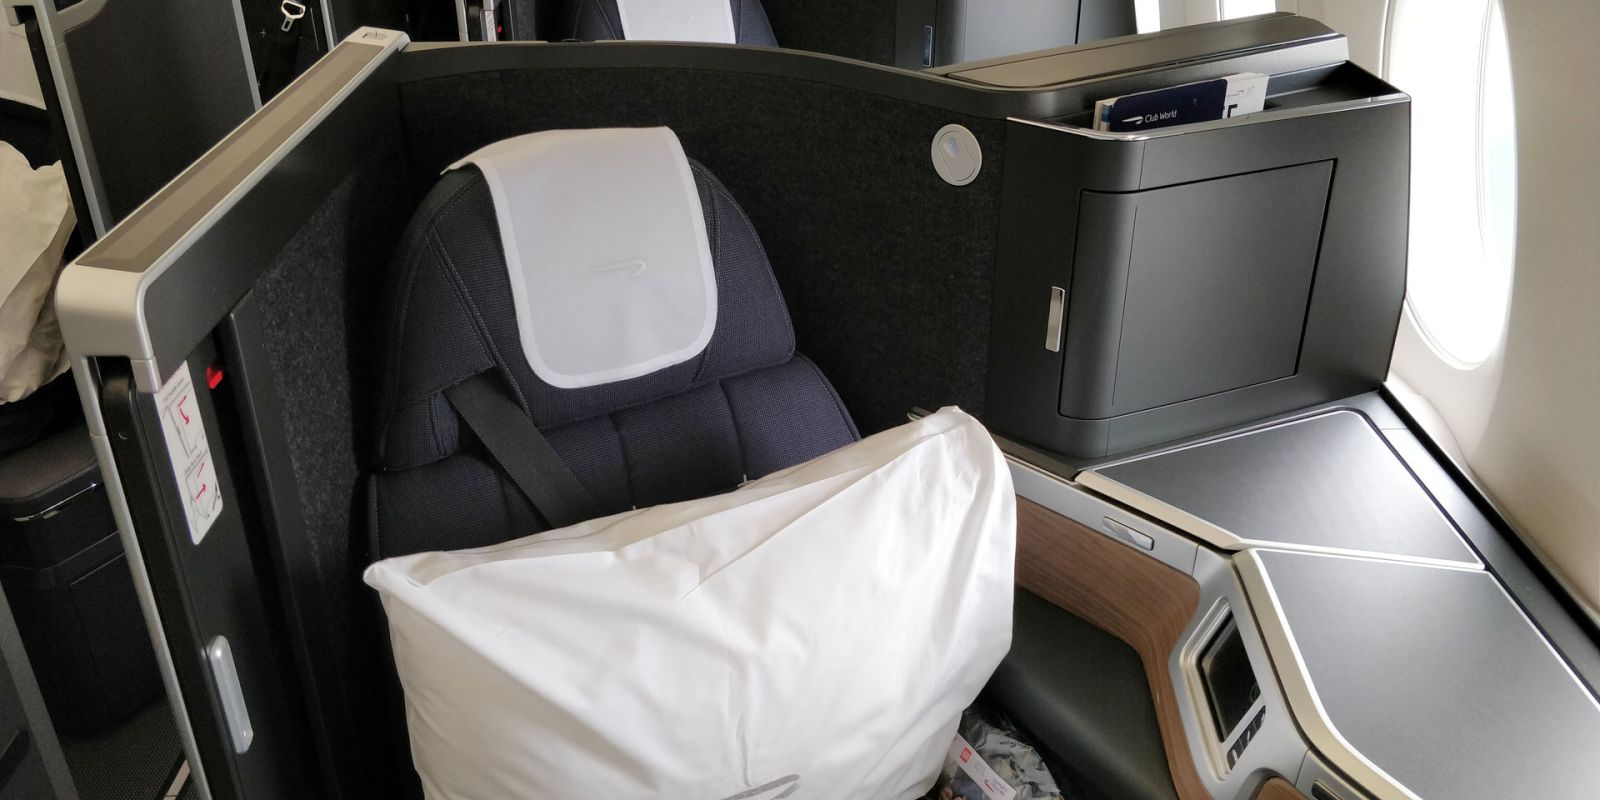 British Airways Business Class Airbus A350 Seat